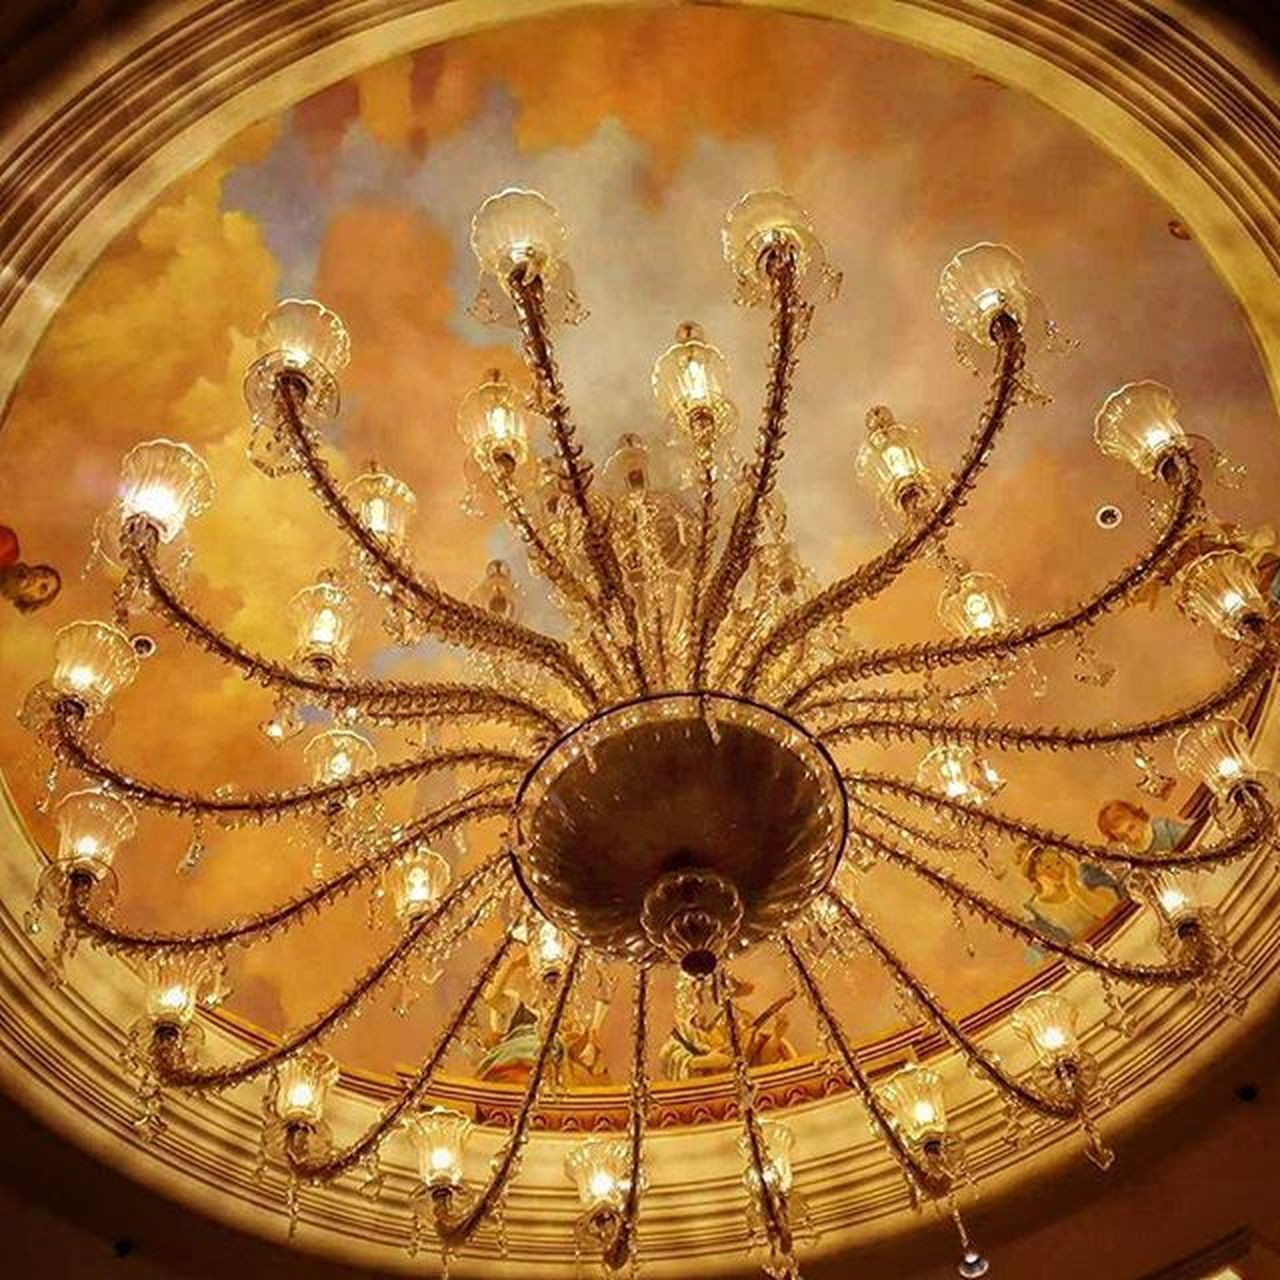 Venetian Venetianlasvegas Art Ceiling Chandelier BeautifulArt Lasvegas Vegasbaby Yolovegas Taramae